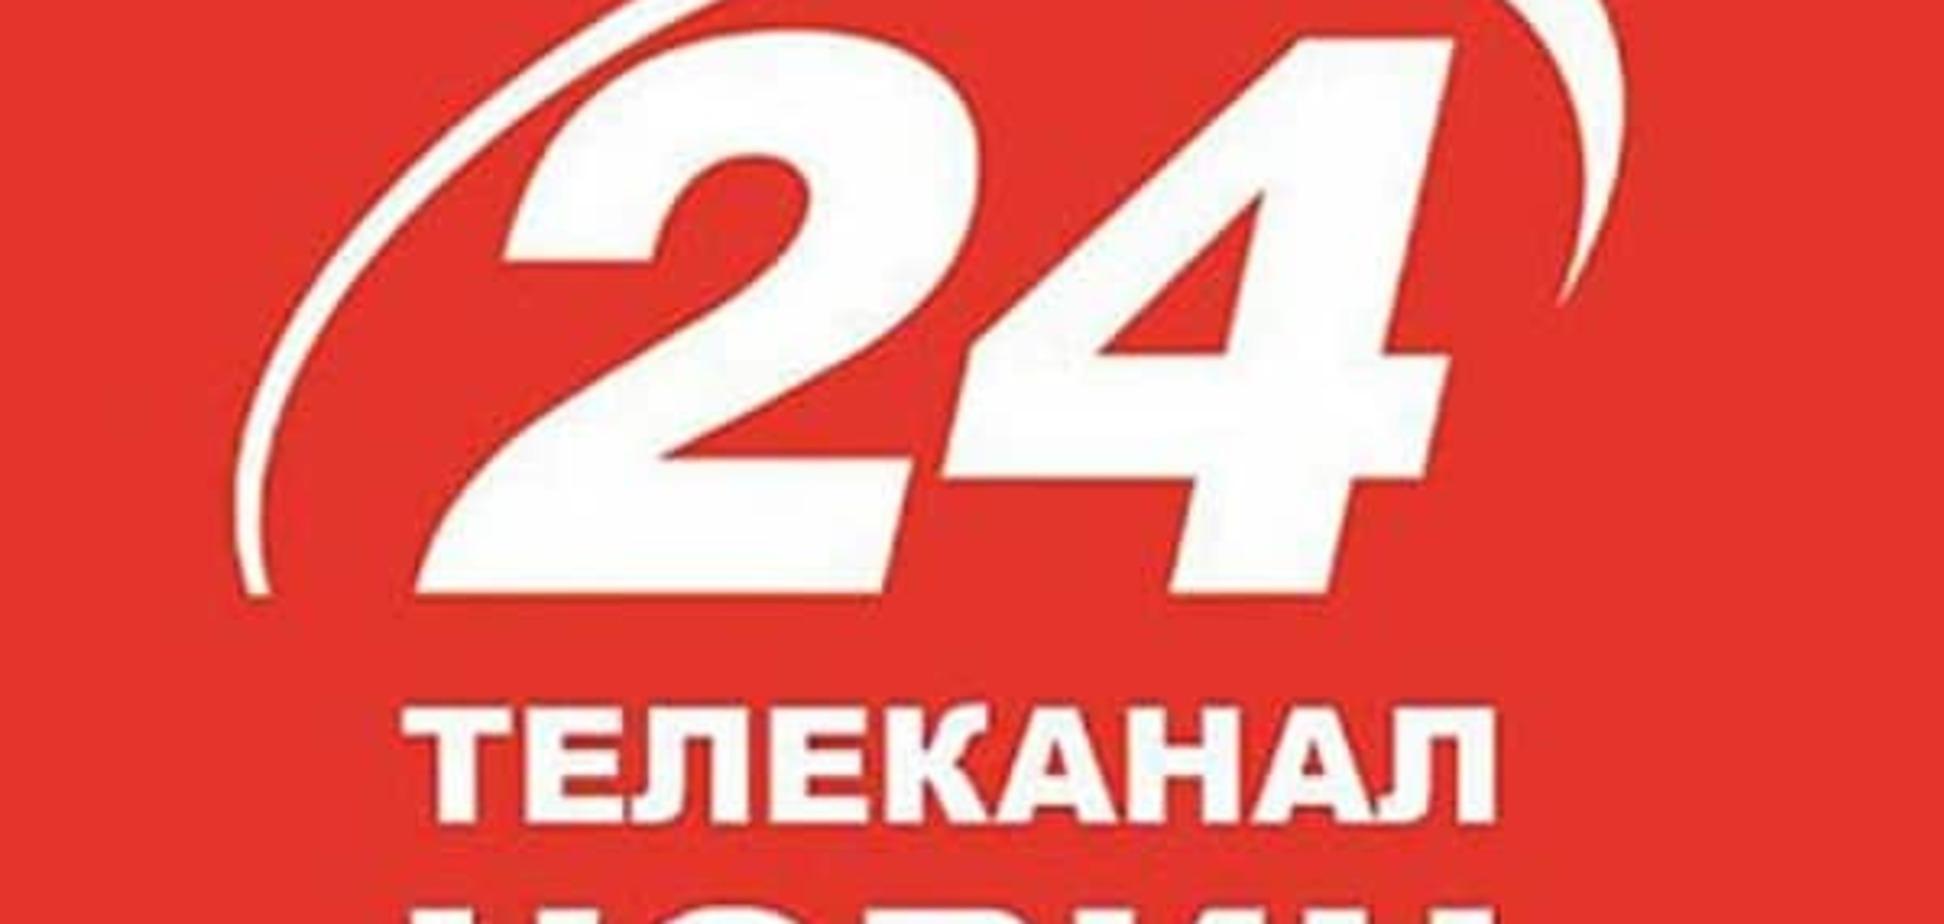 Журналисту '24 канала' запретили снимать запорожский завод